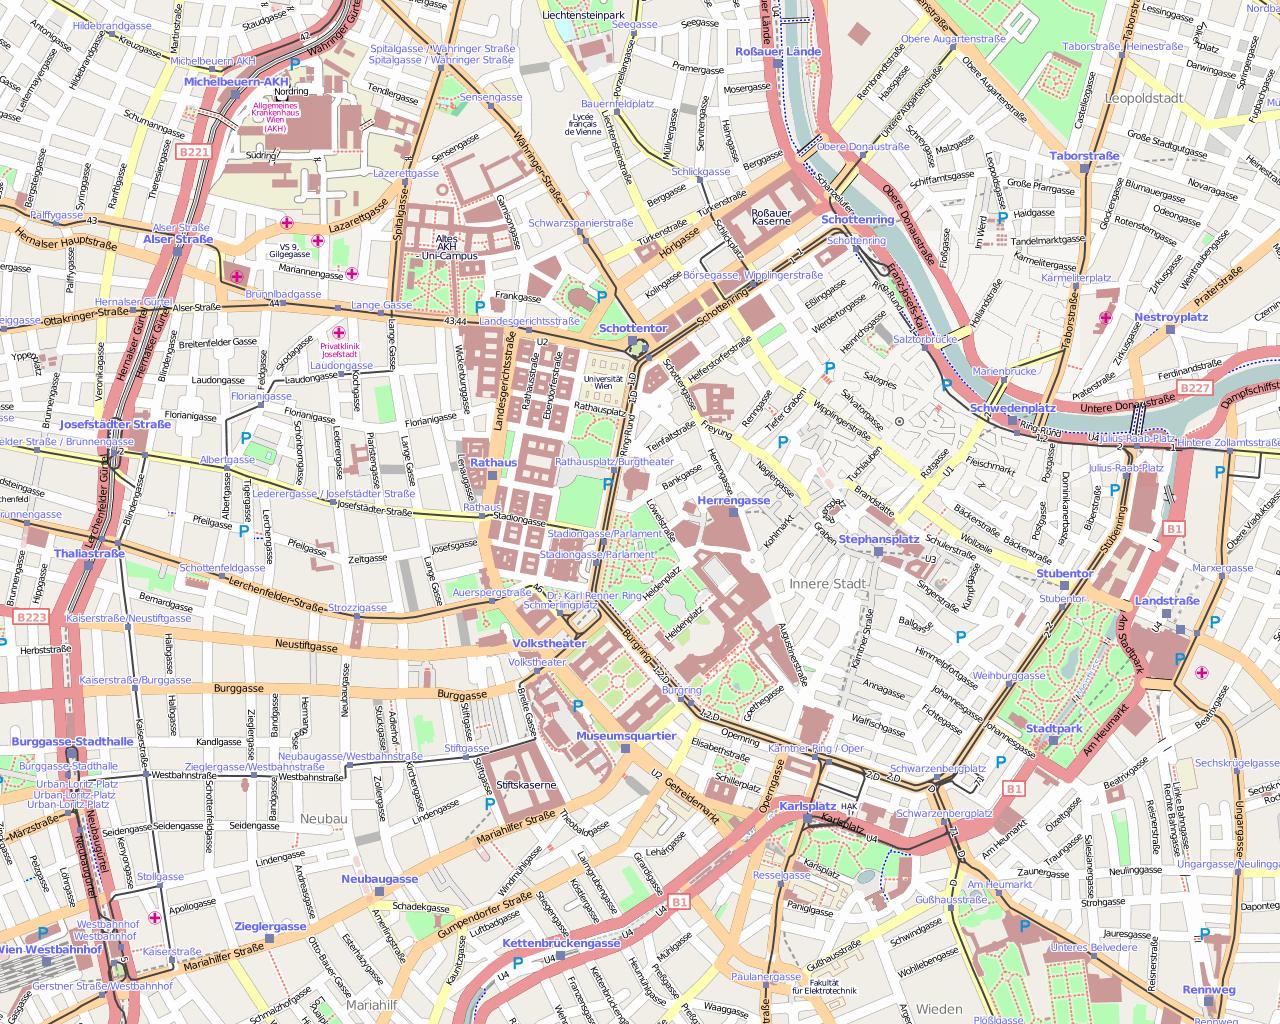 Online Floorplan Pressemitteilung Wien Openstreetmap